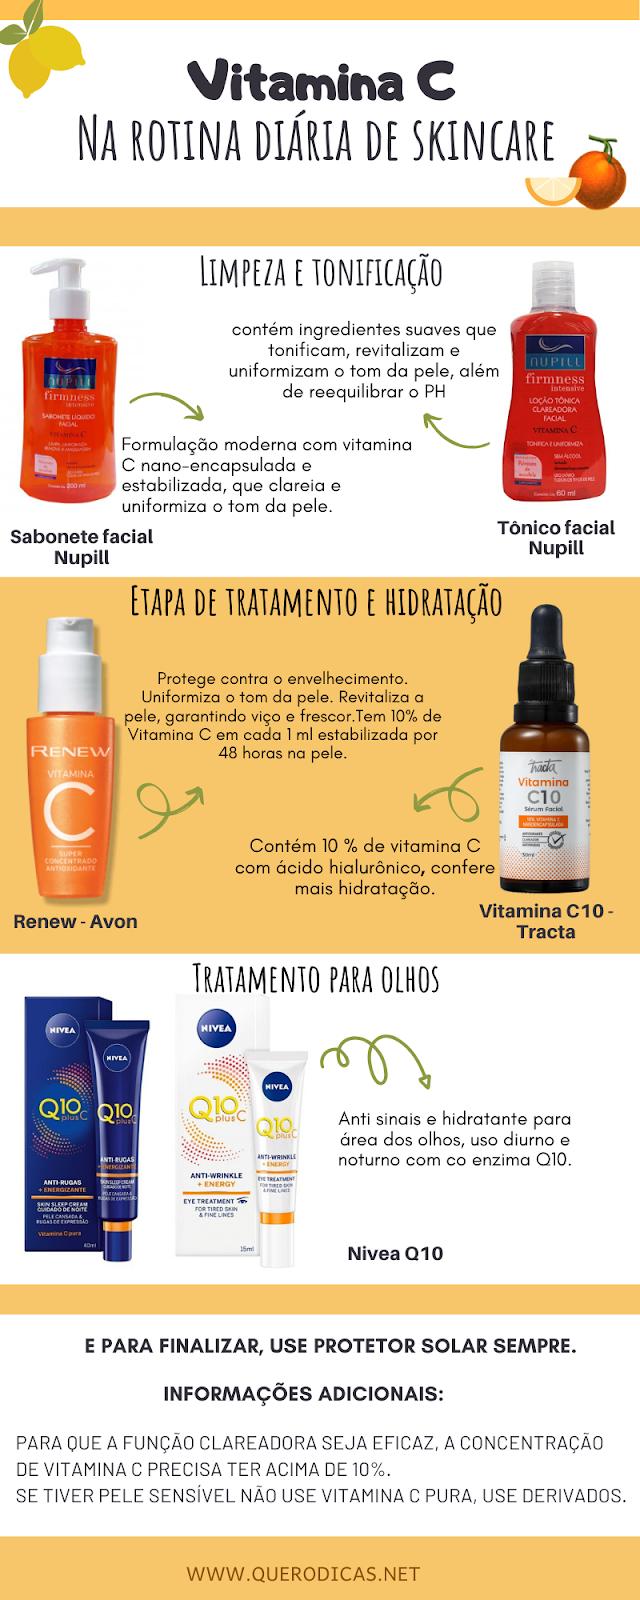 Vitamina c na rotina de skincare